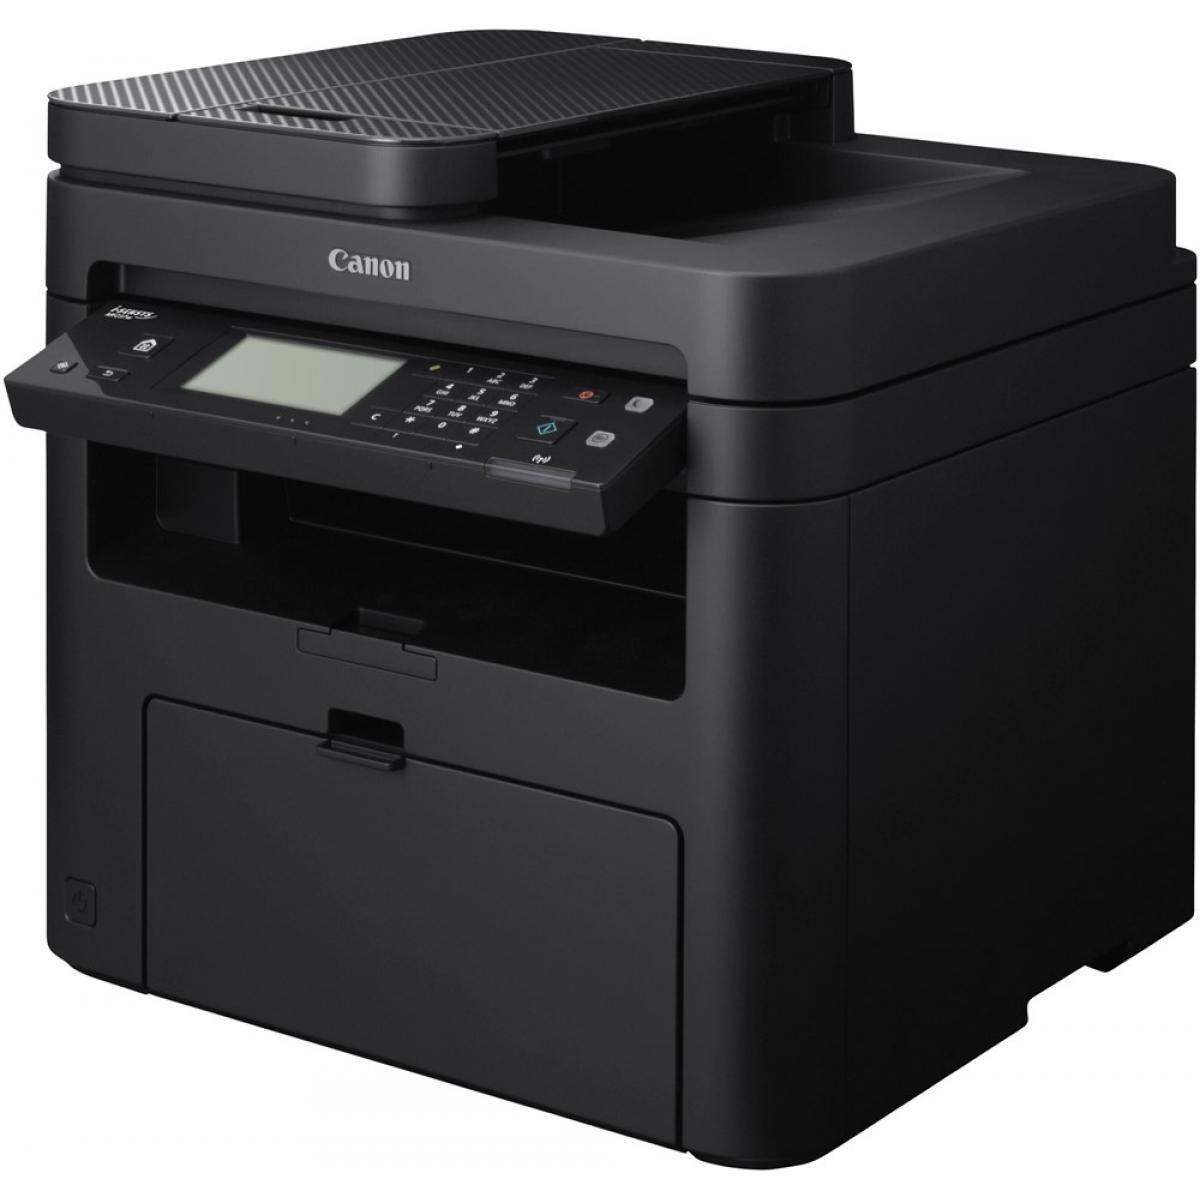 Canon i-SENSYS MF237W Mono Laser All-In-One Multifunction Printer | MF237W | Compu Jordan for Computers